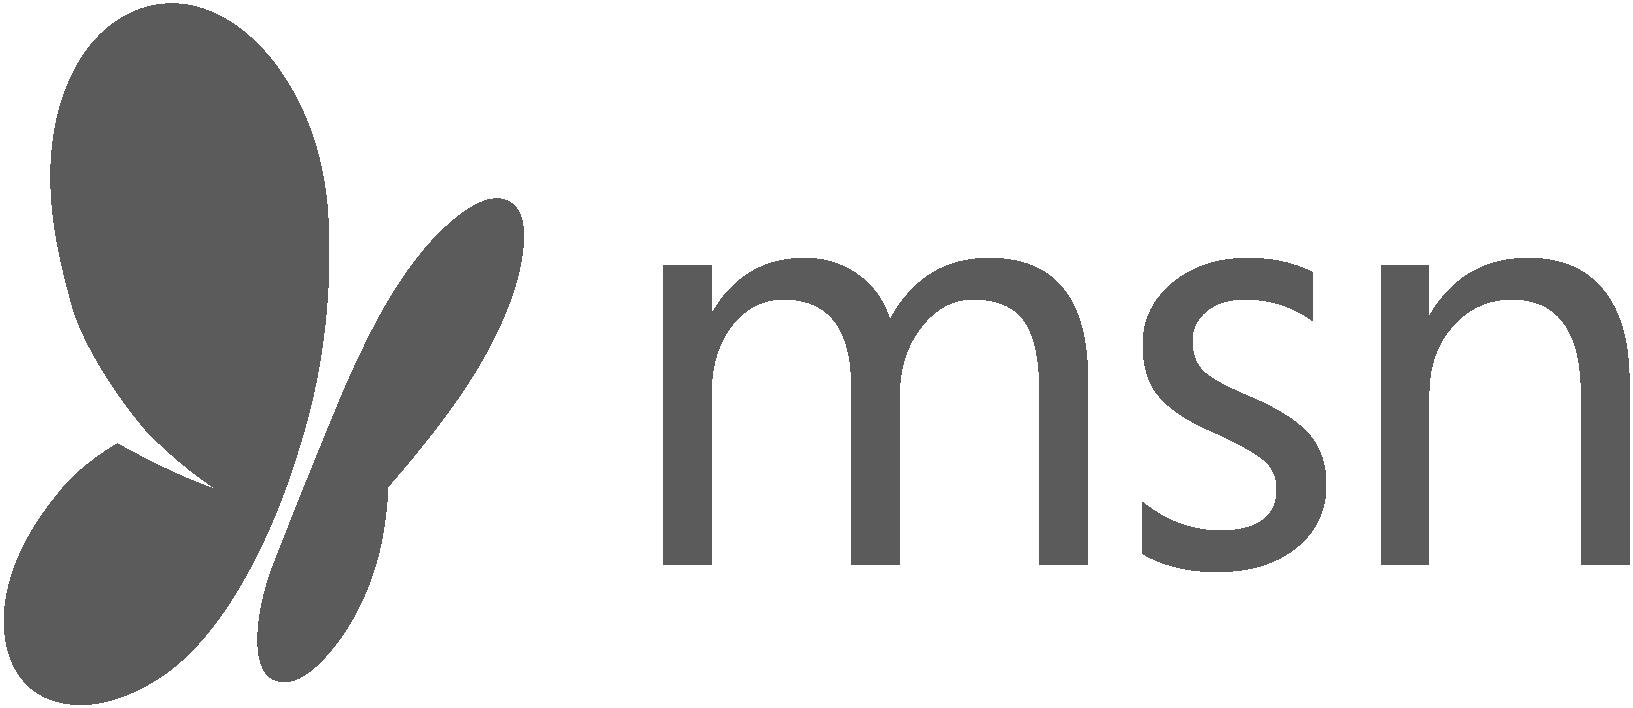 kisspng-msn-news-0-logo-february-mickey-logo-5b2d7a147b5693.8812897815297070285052